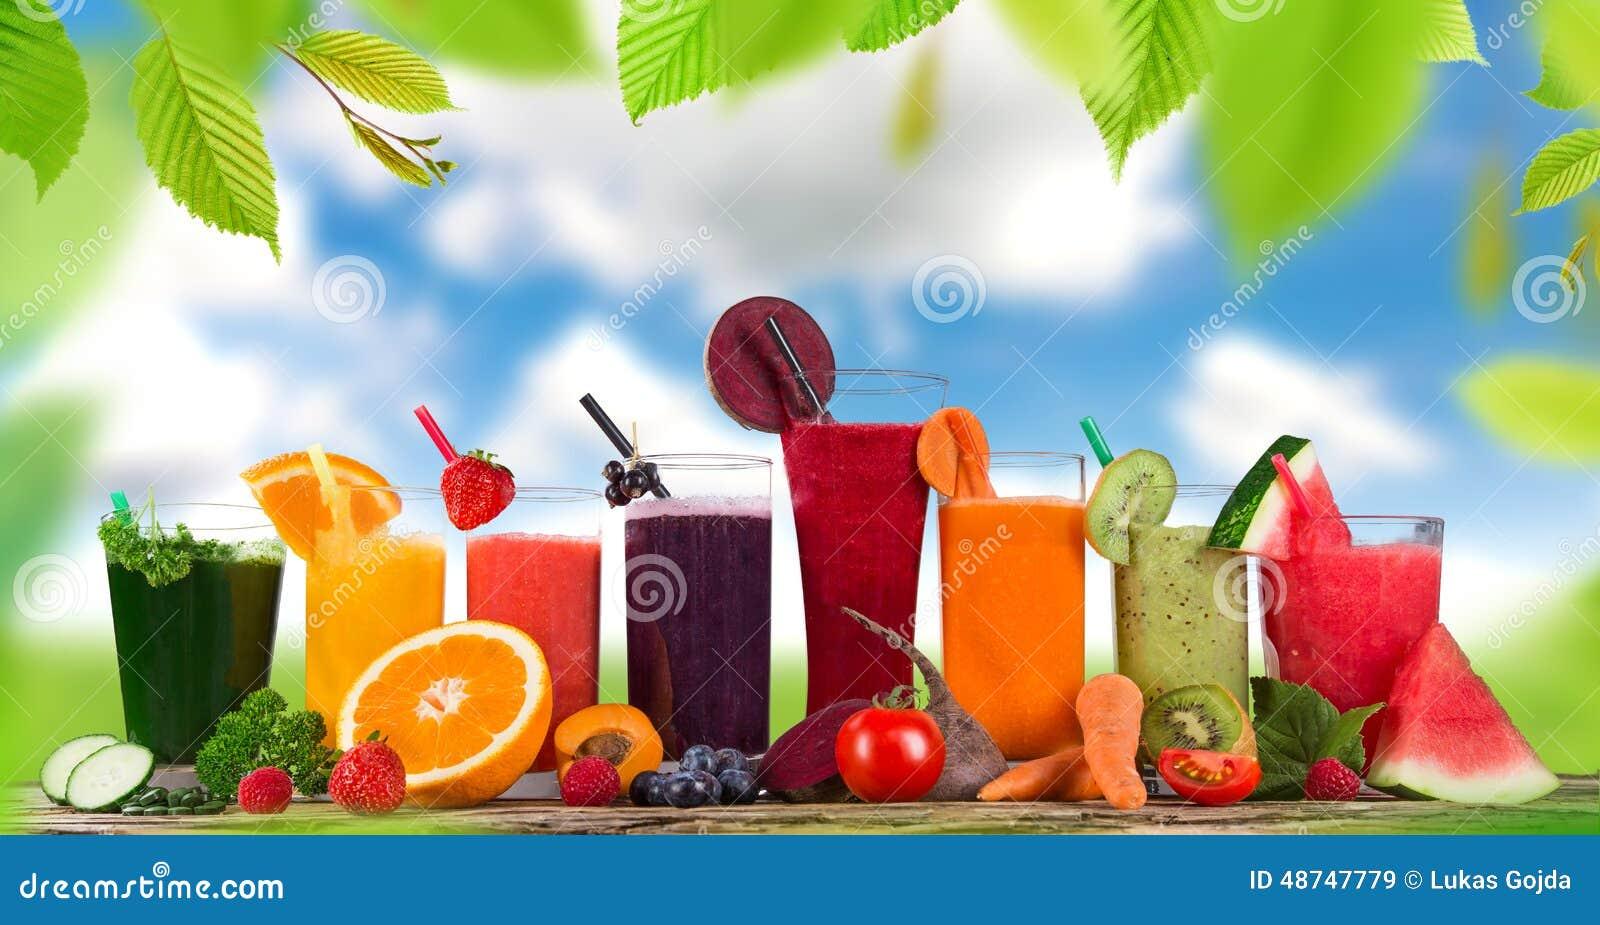 mayapple fruit healthy fruit drinks